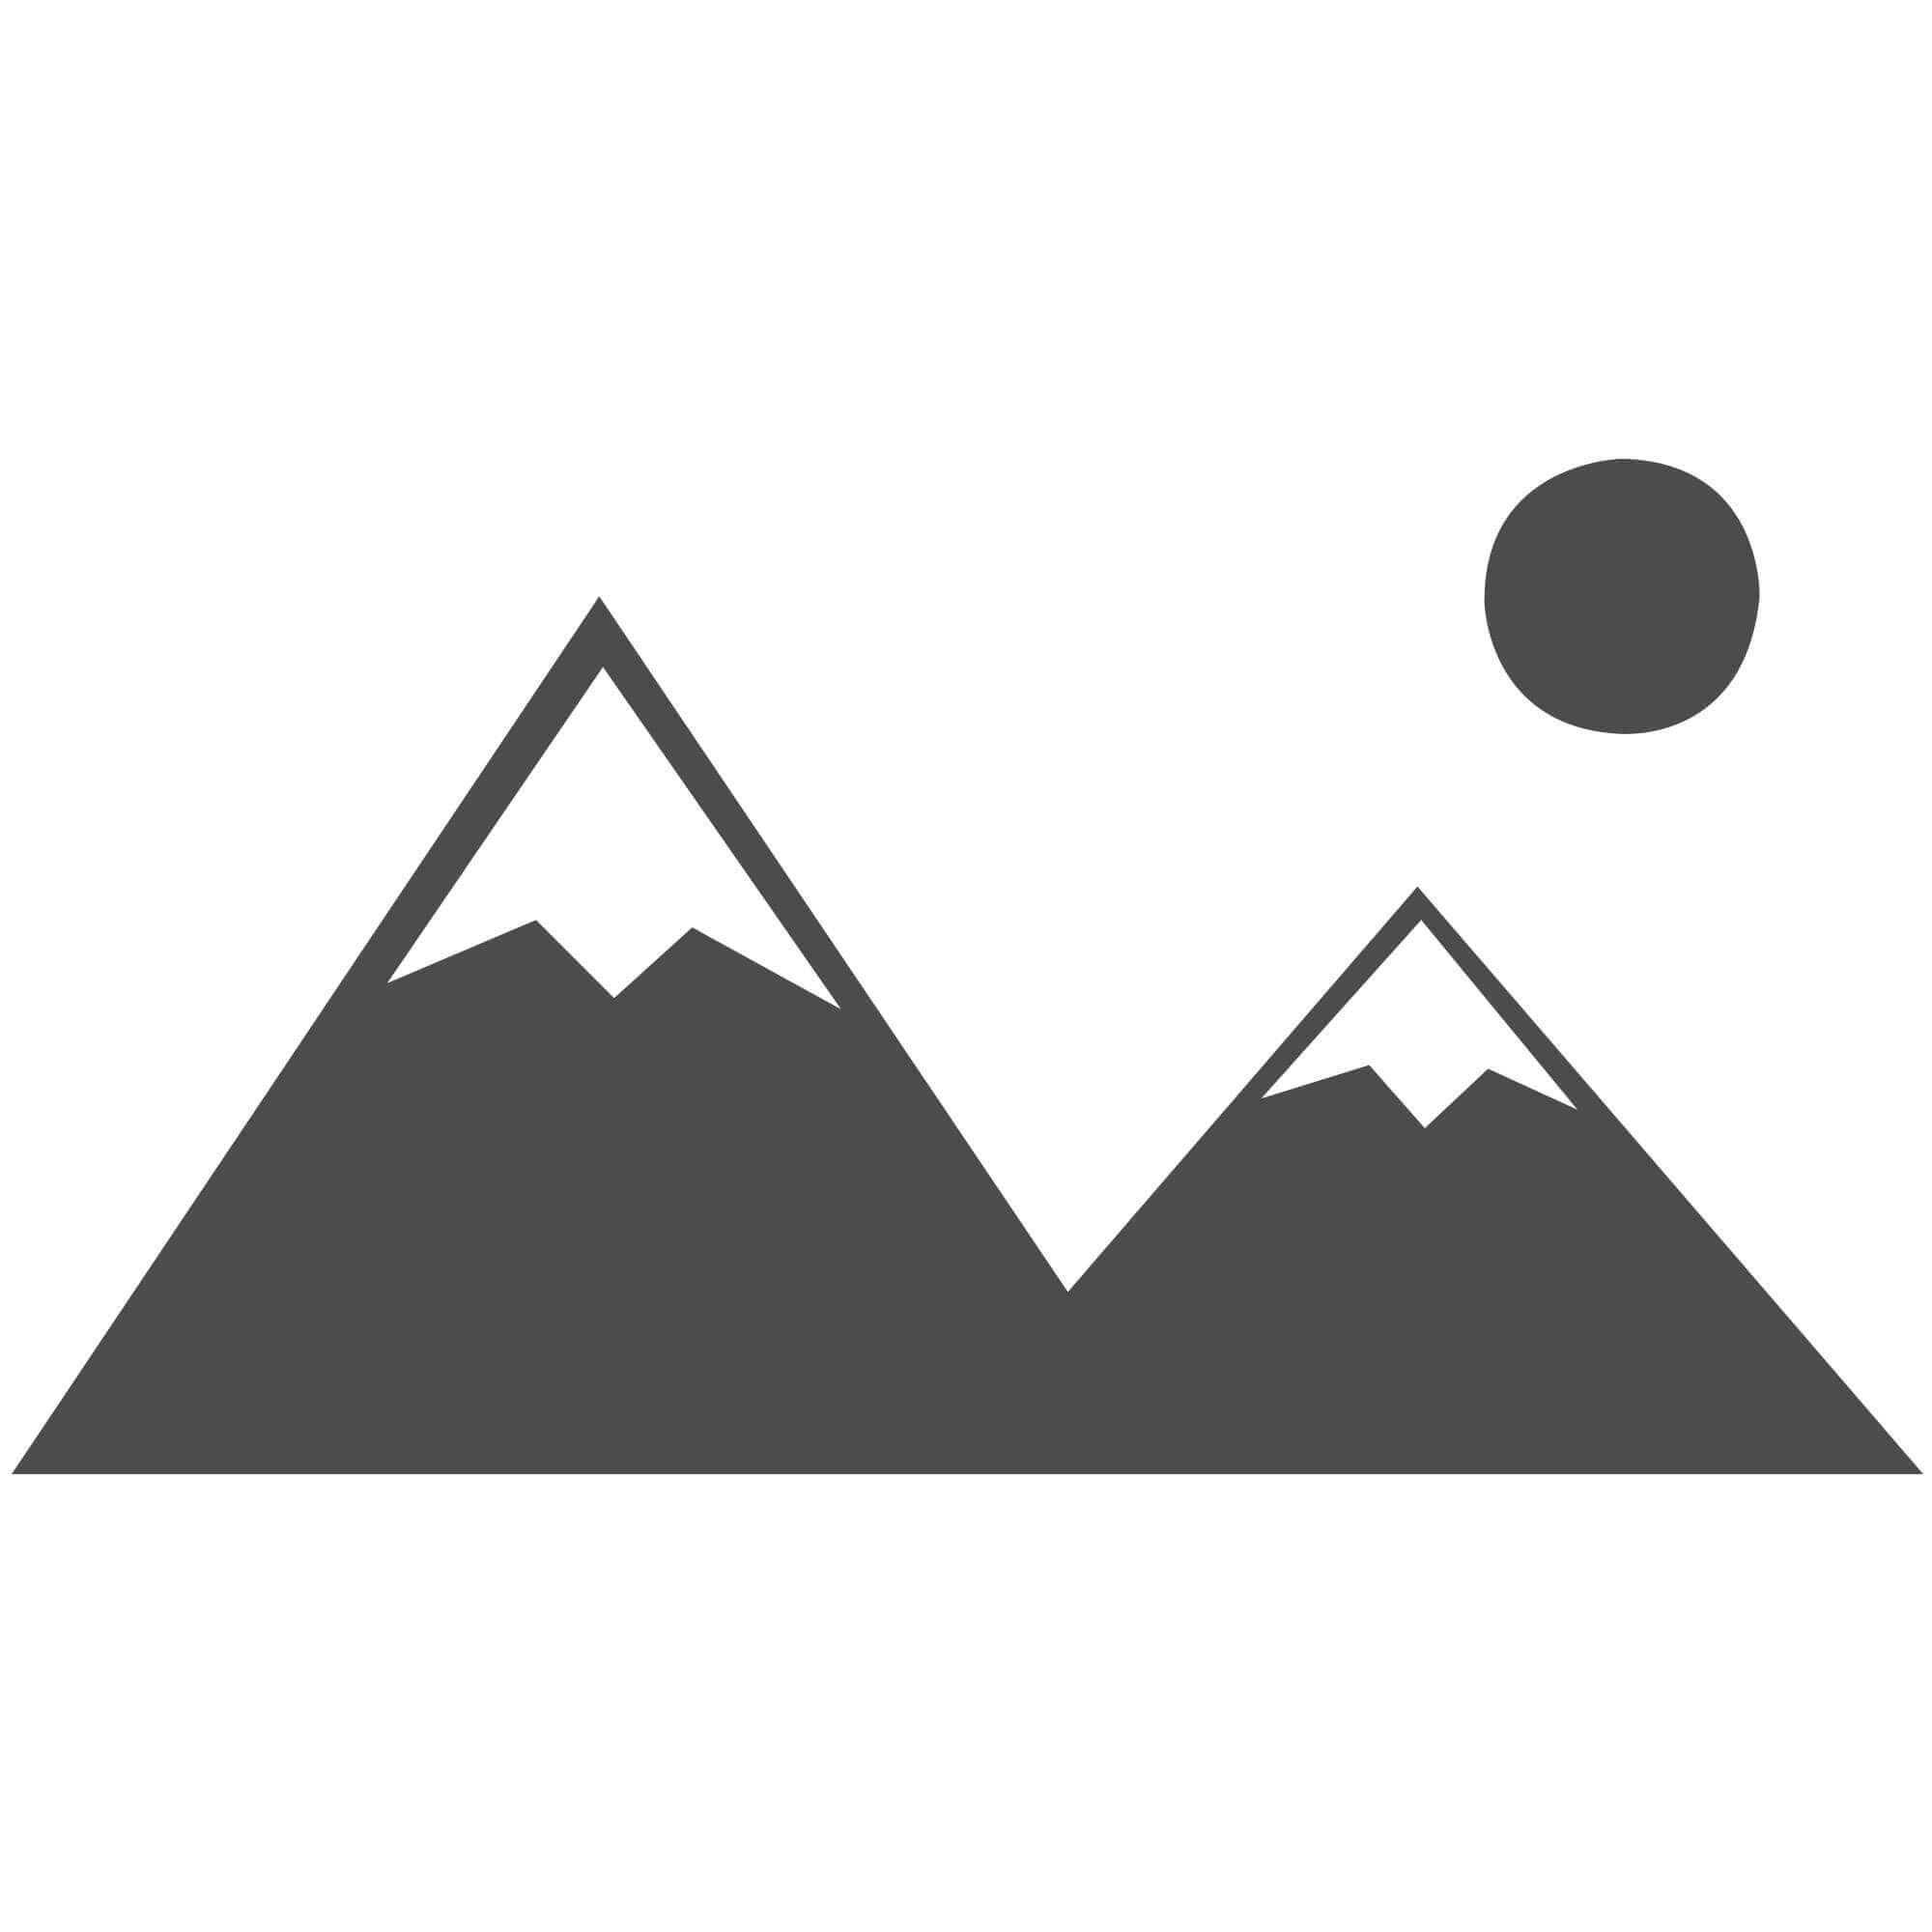 "Brighton Indoor Outdoor Rug - 0122-4000-120 x 170 cm (4' x 5'7"")"